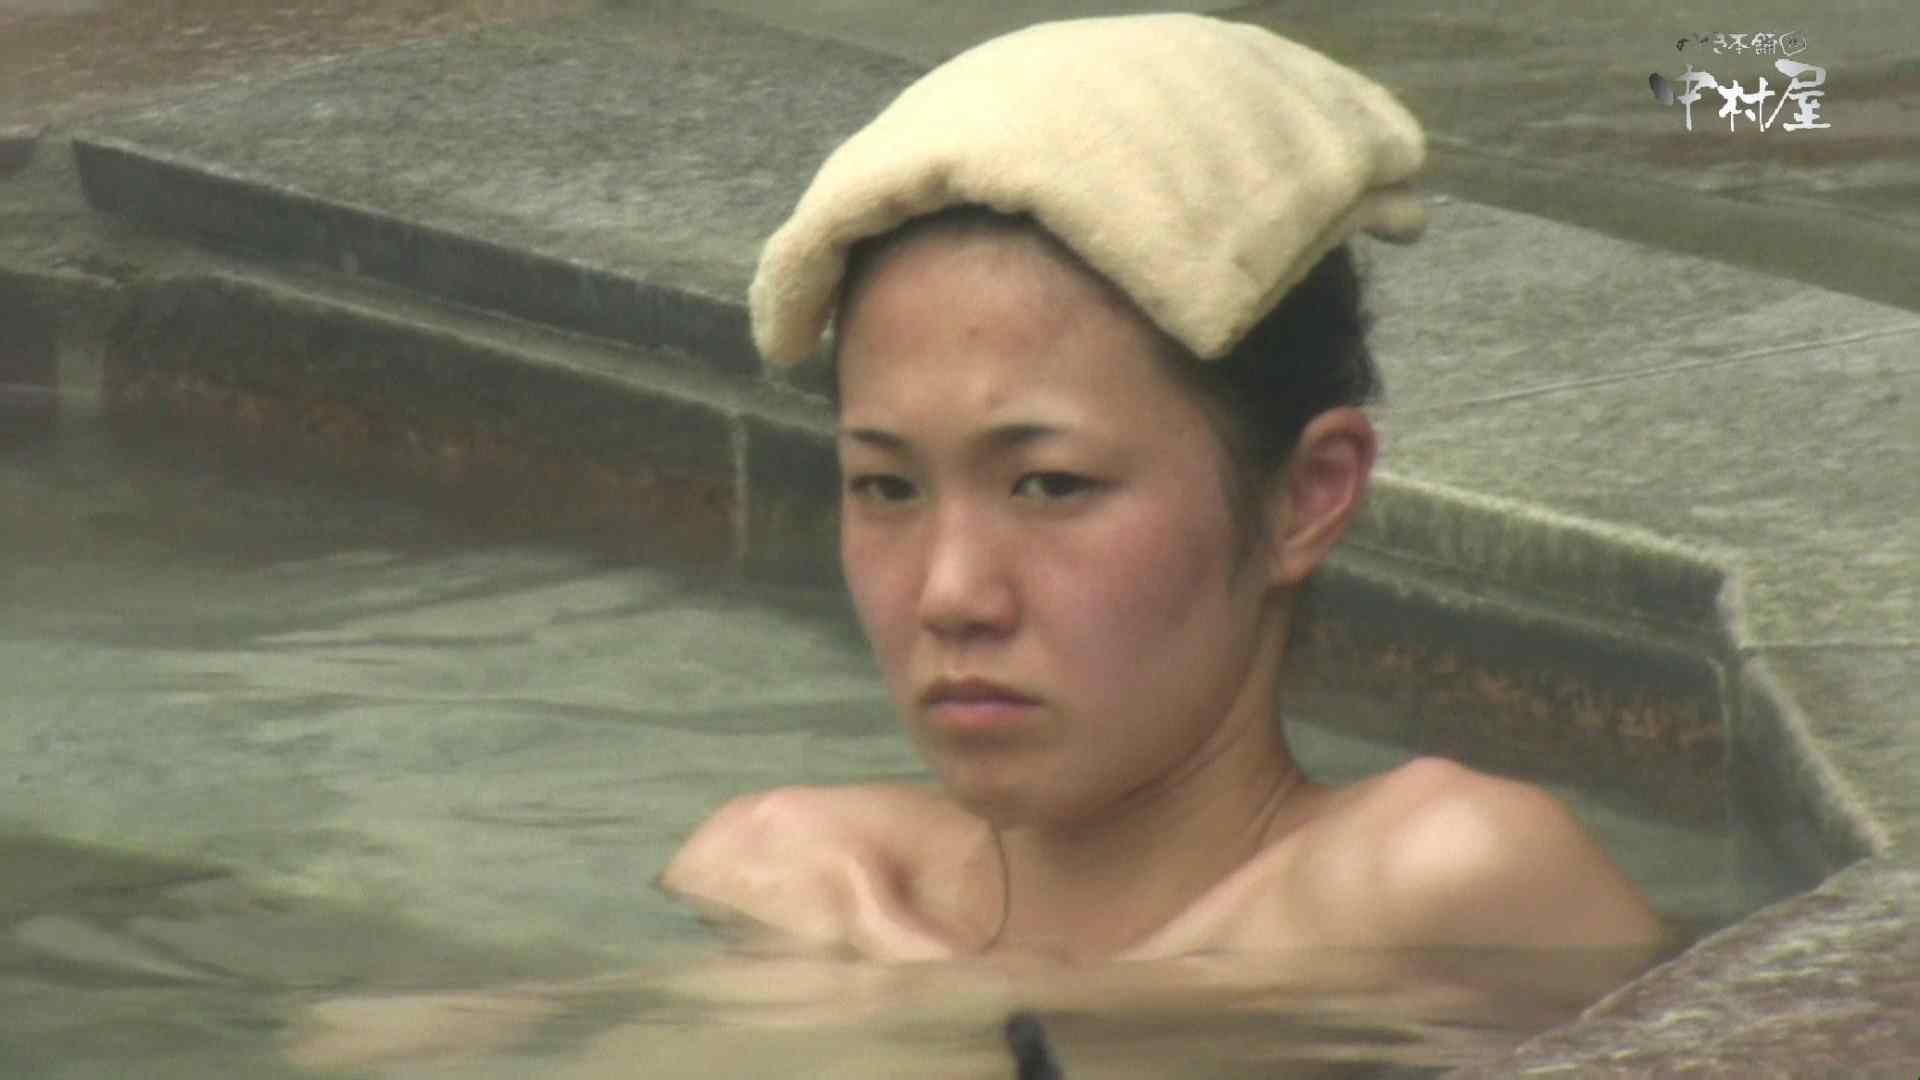 Aquaな露天風呂Vol.889 0  87連発 70